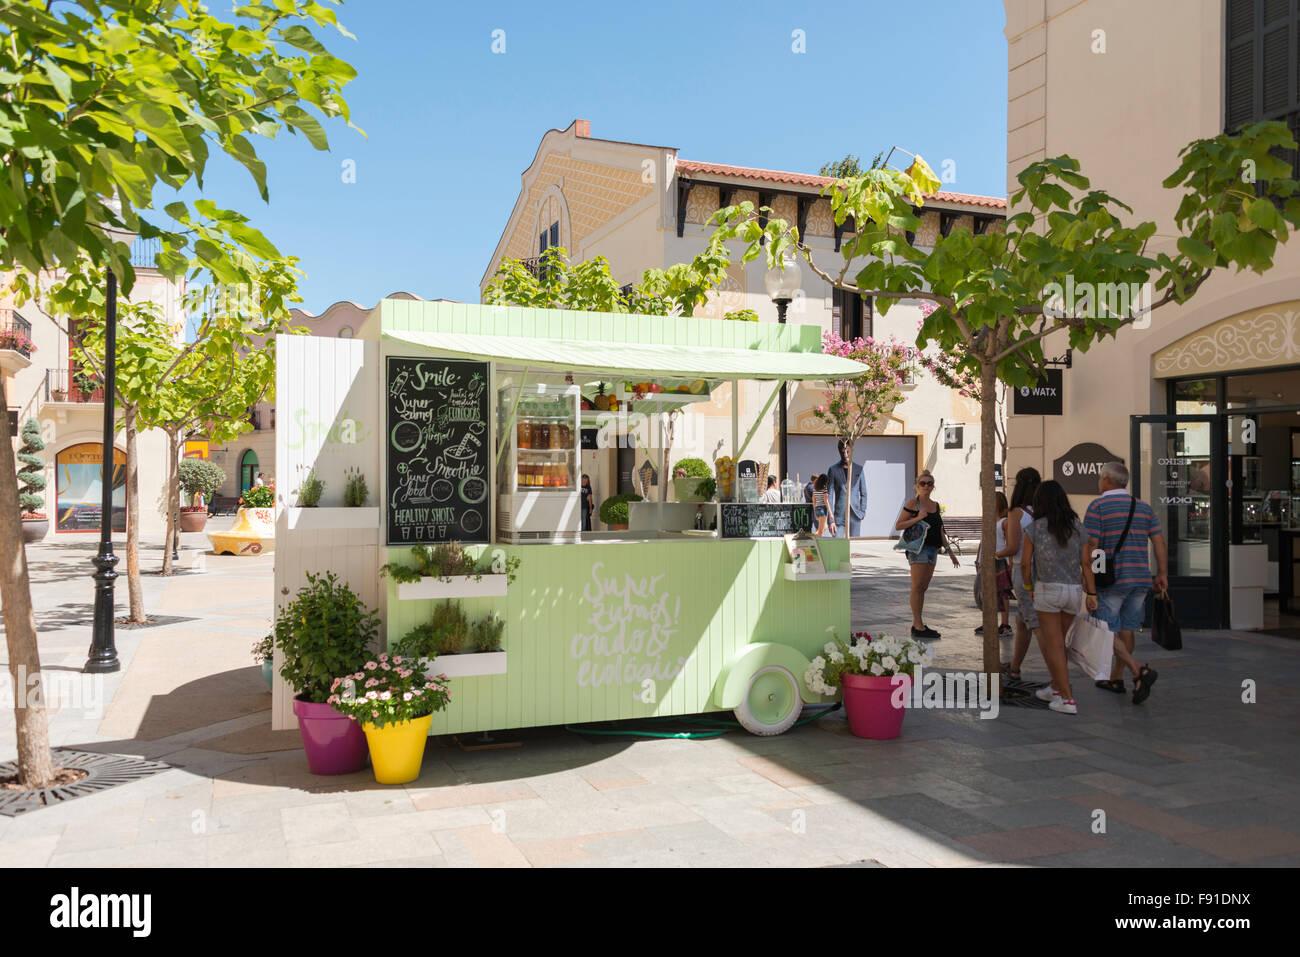 'Smile' smoothie drinks stall La Roca Outlet Village, La Roca del Vallès, Barcelona, Province of Barcelona, Catalonia, Spain Stock Photo